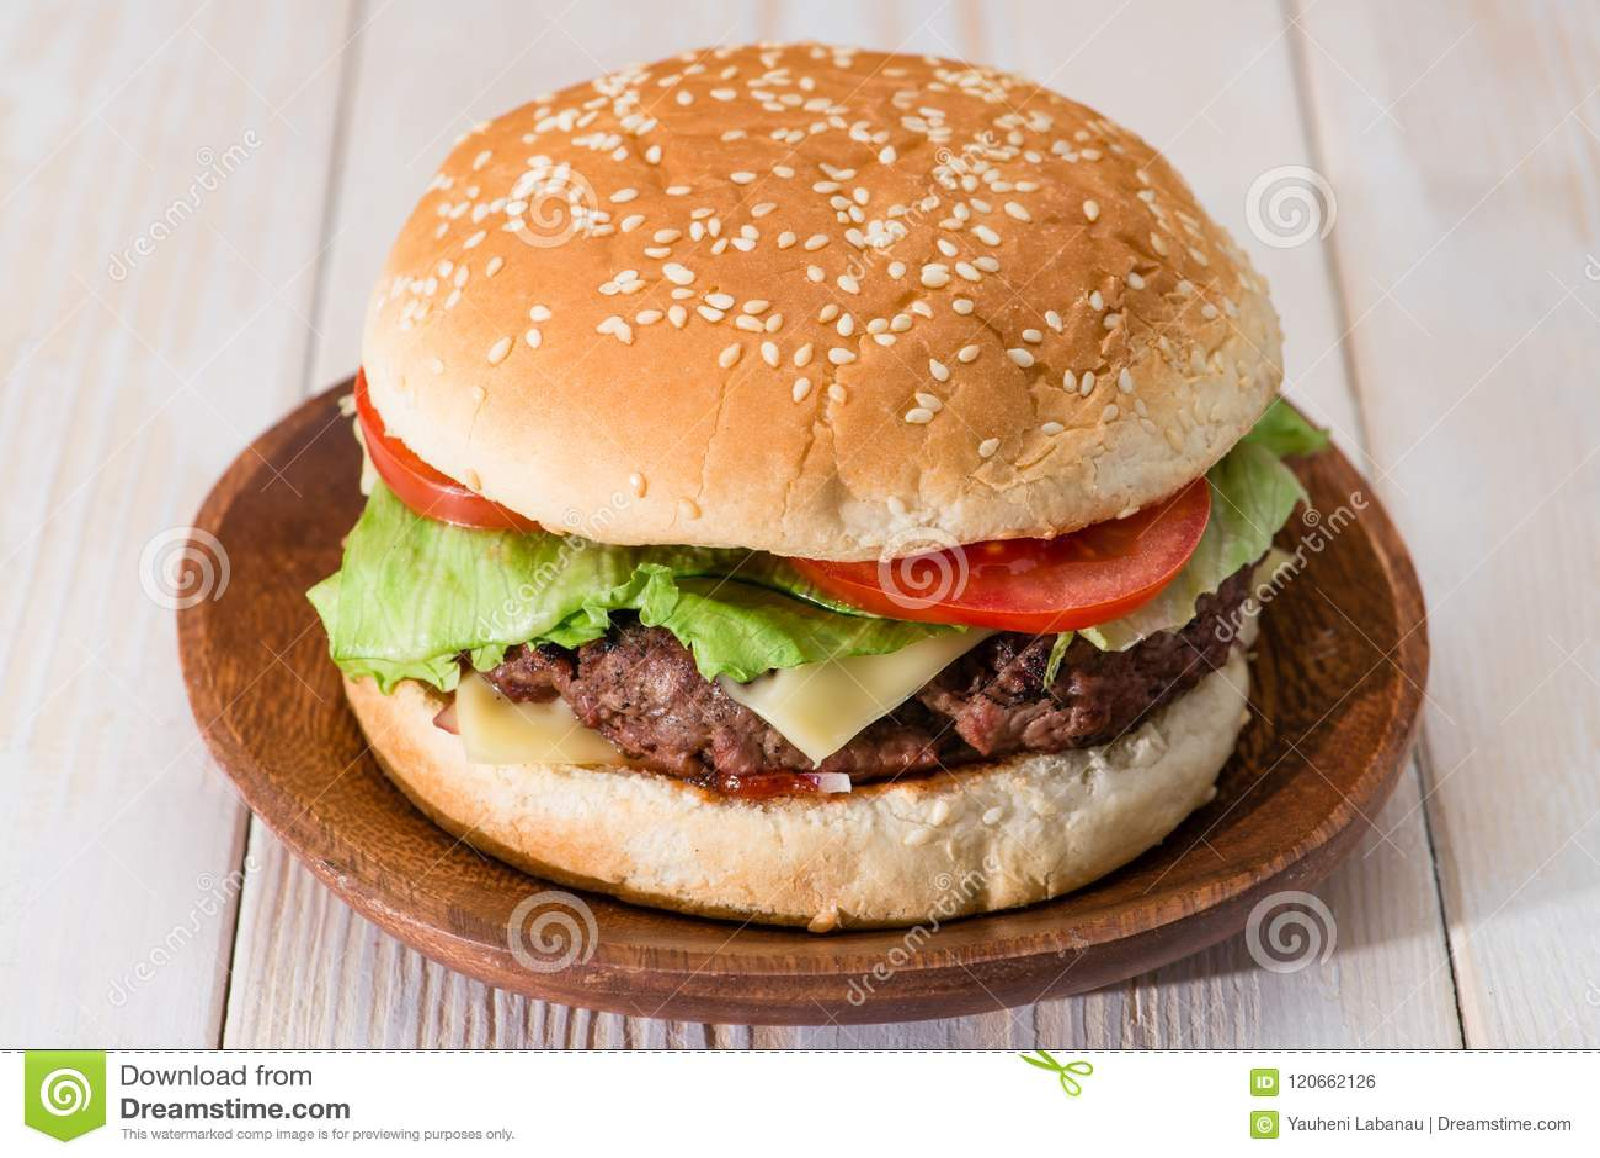 classic burger close-up